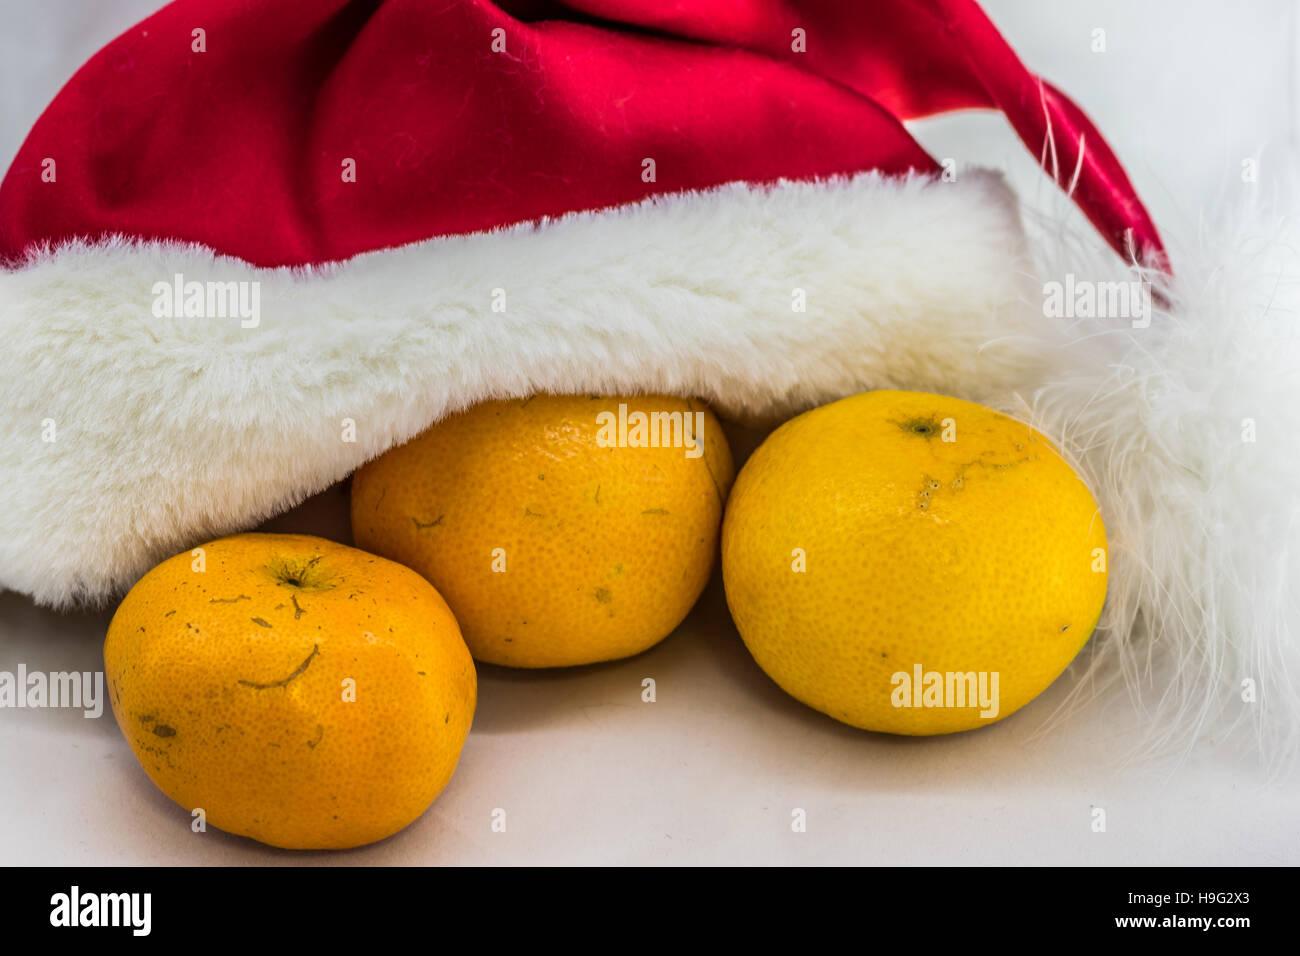 Christmas oranges - Stock Image